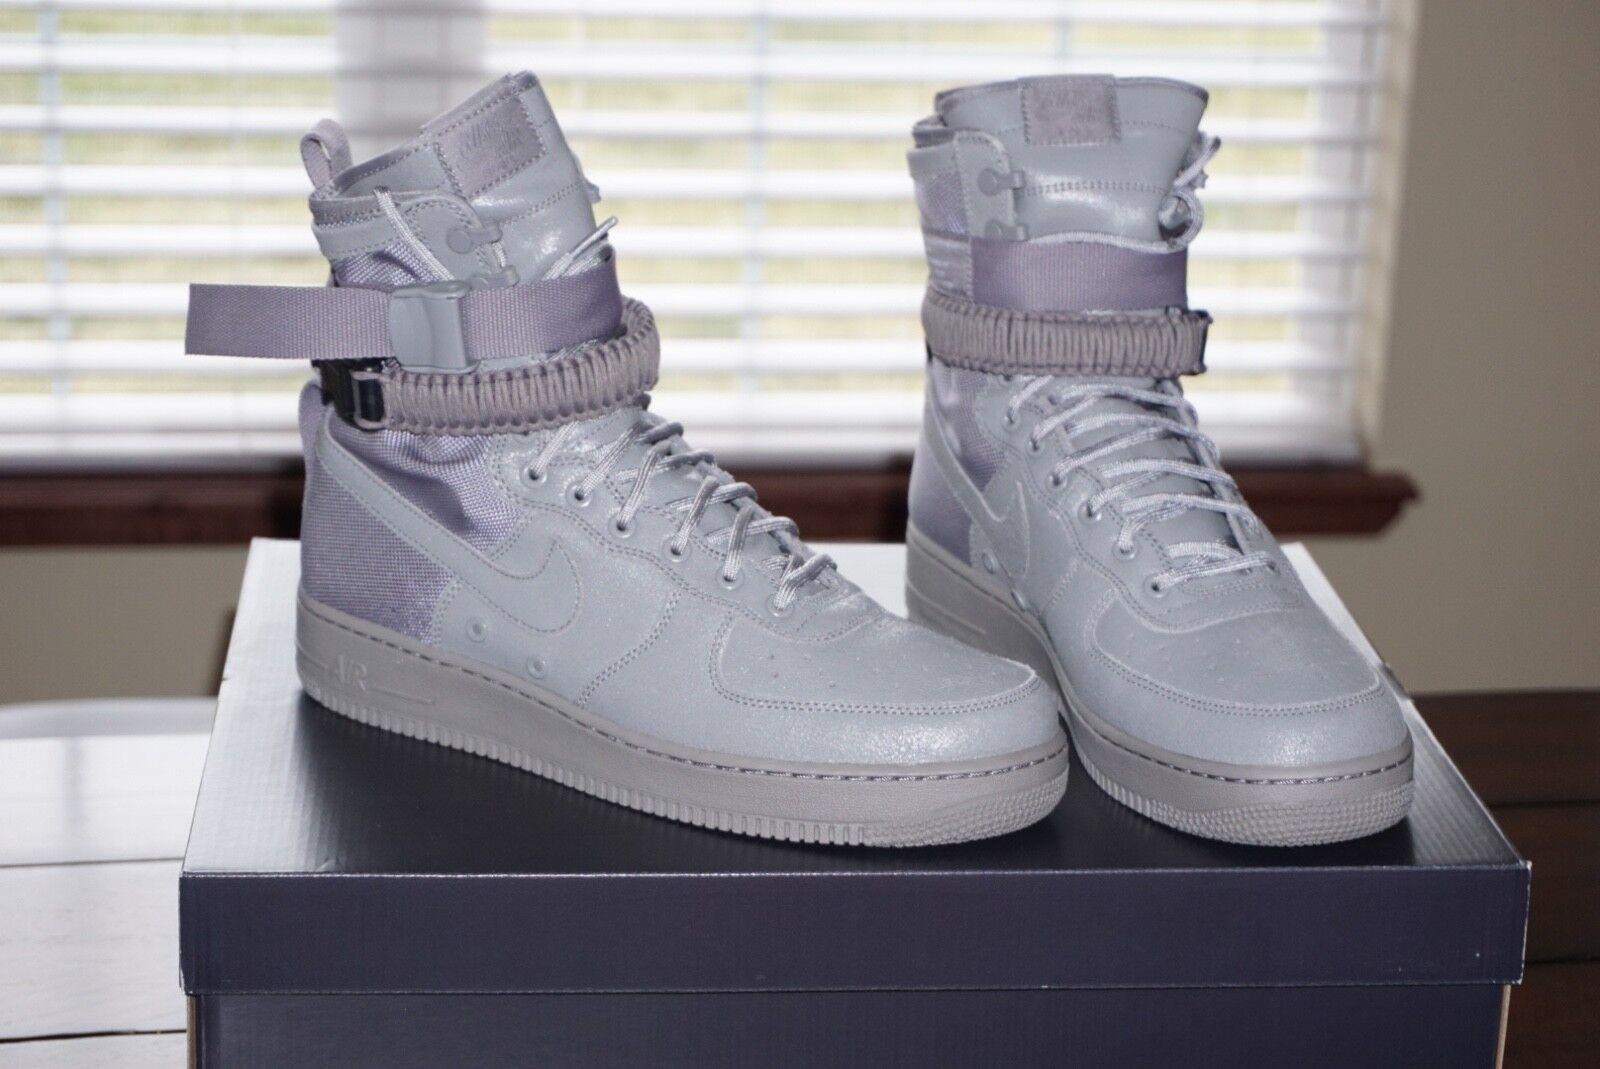 Nike - air force 1 sf - Nike männer - größe 11,5 staub graue turnschuhe 903270-001 6c7c02